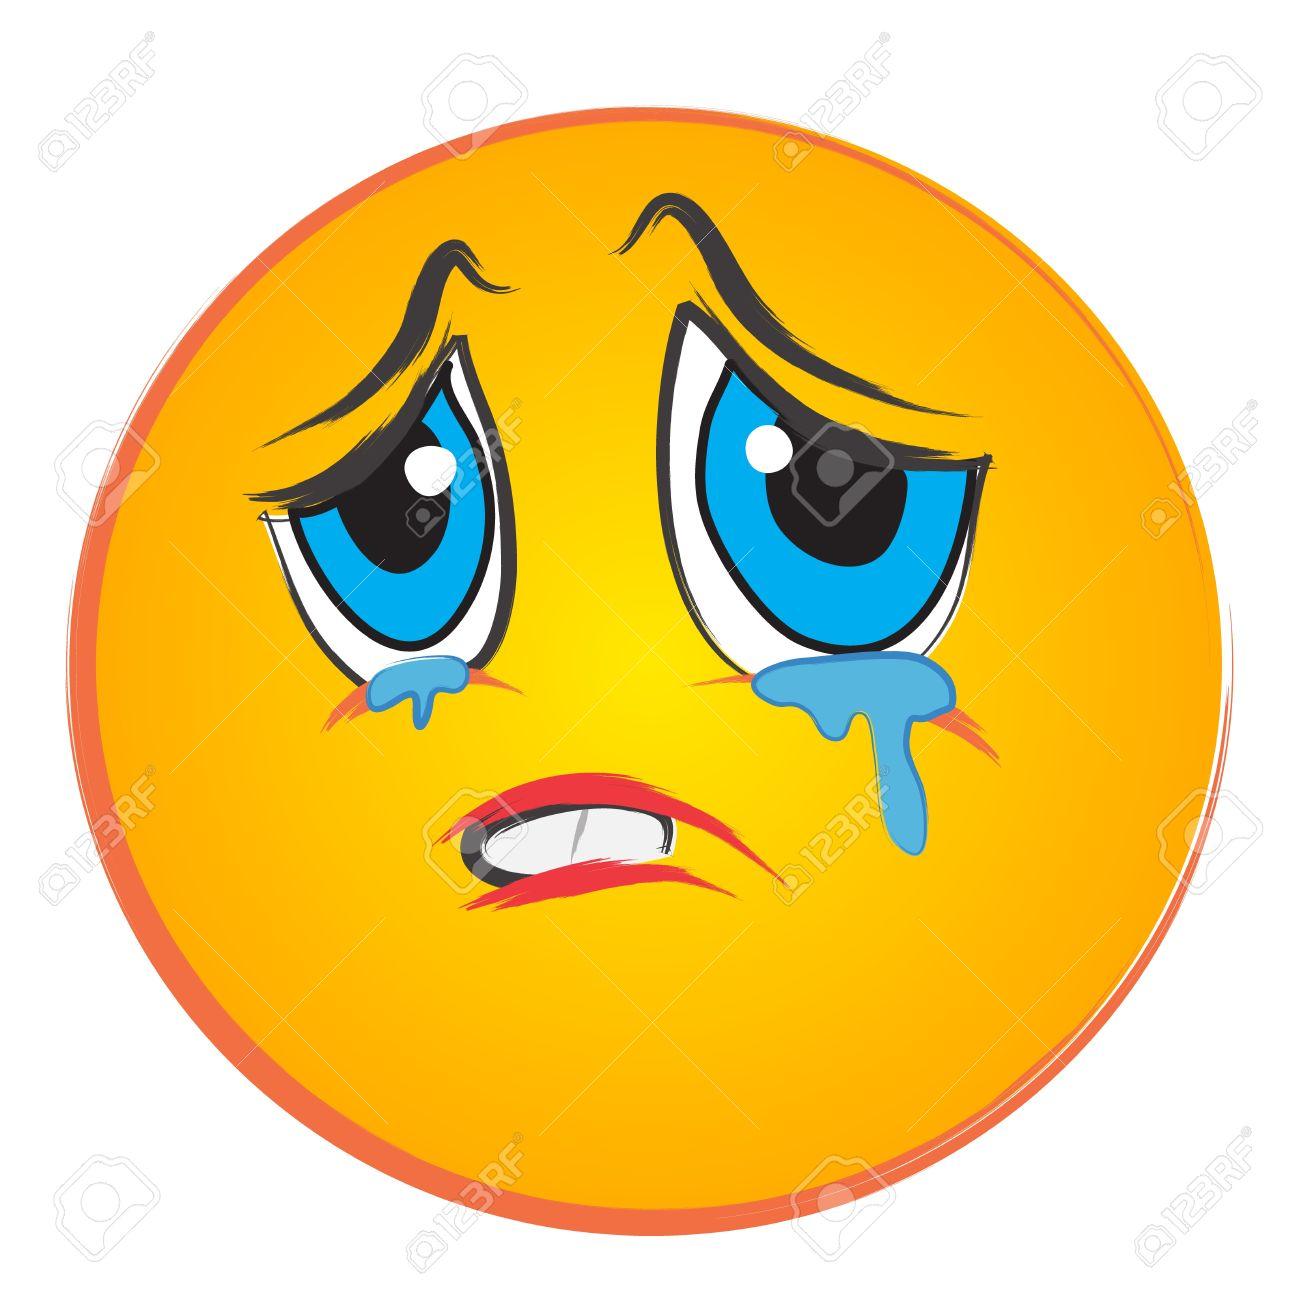 Tears clipart animated Crying Clip face Sad &